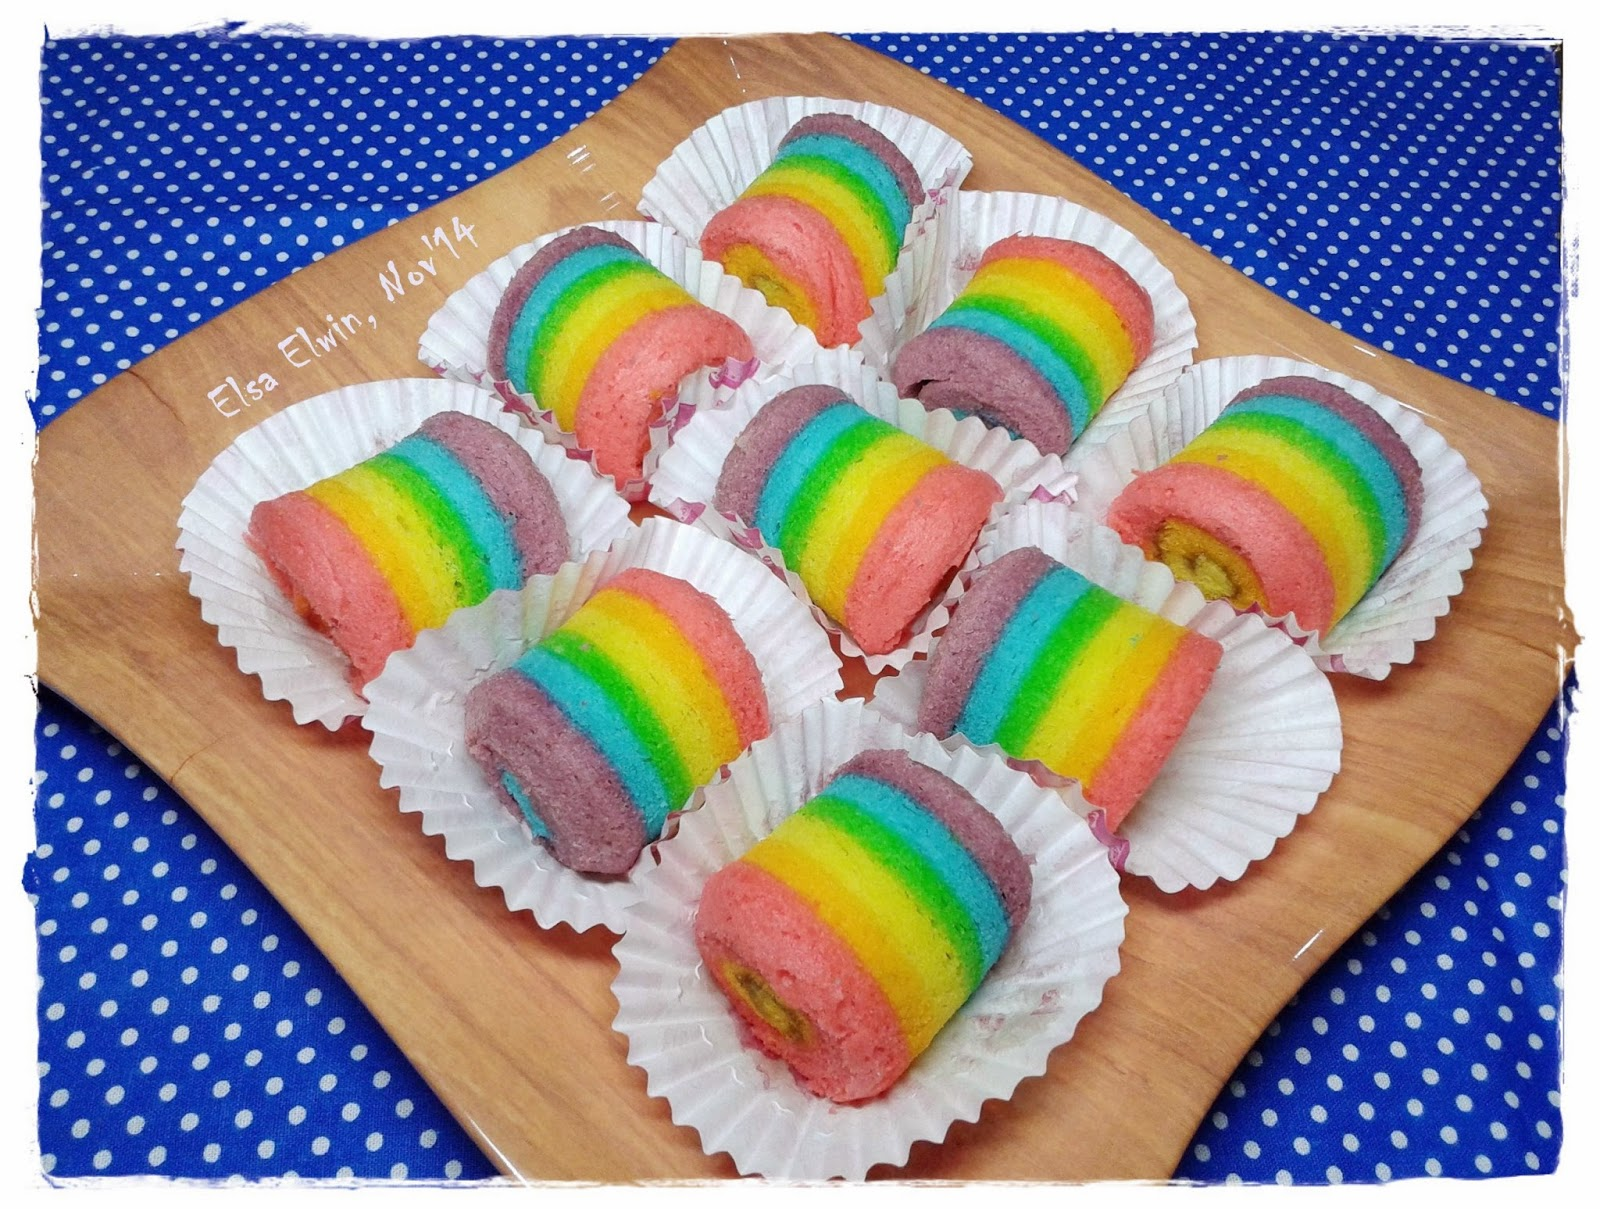 Elsa Elwin Mini Rainbow Roll Cake